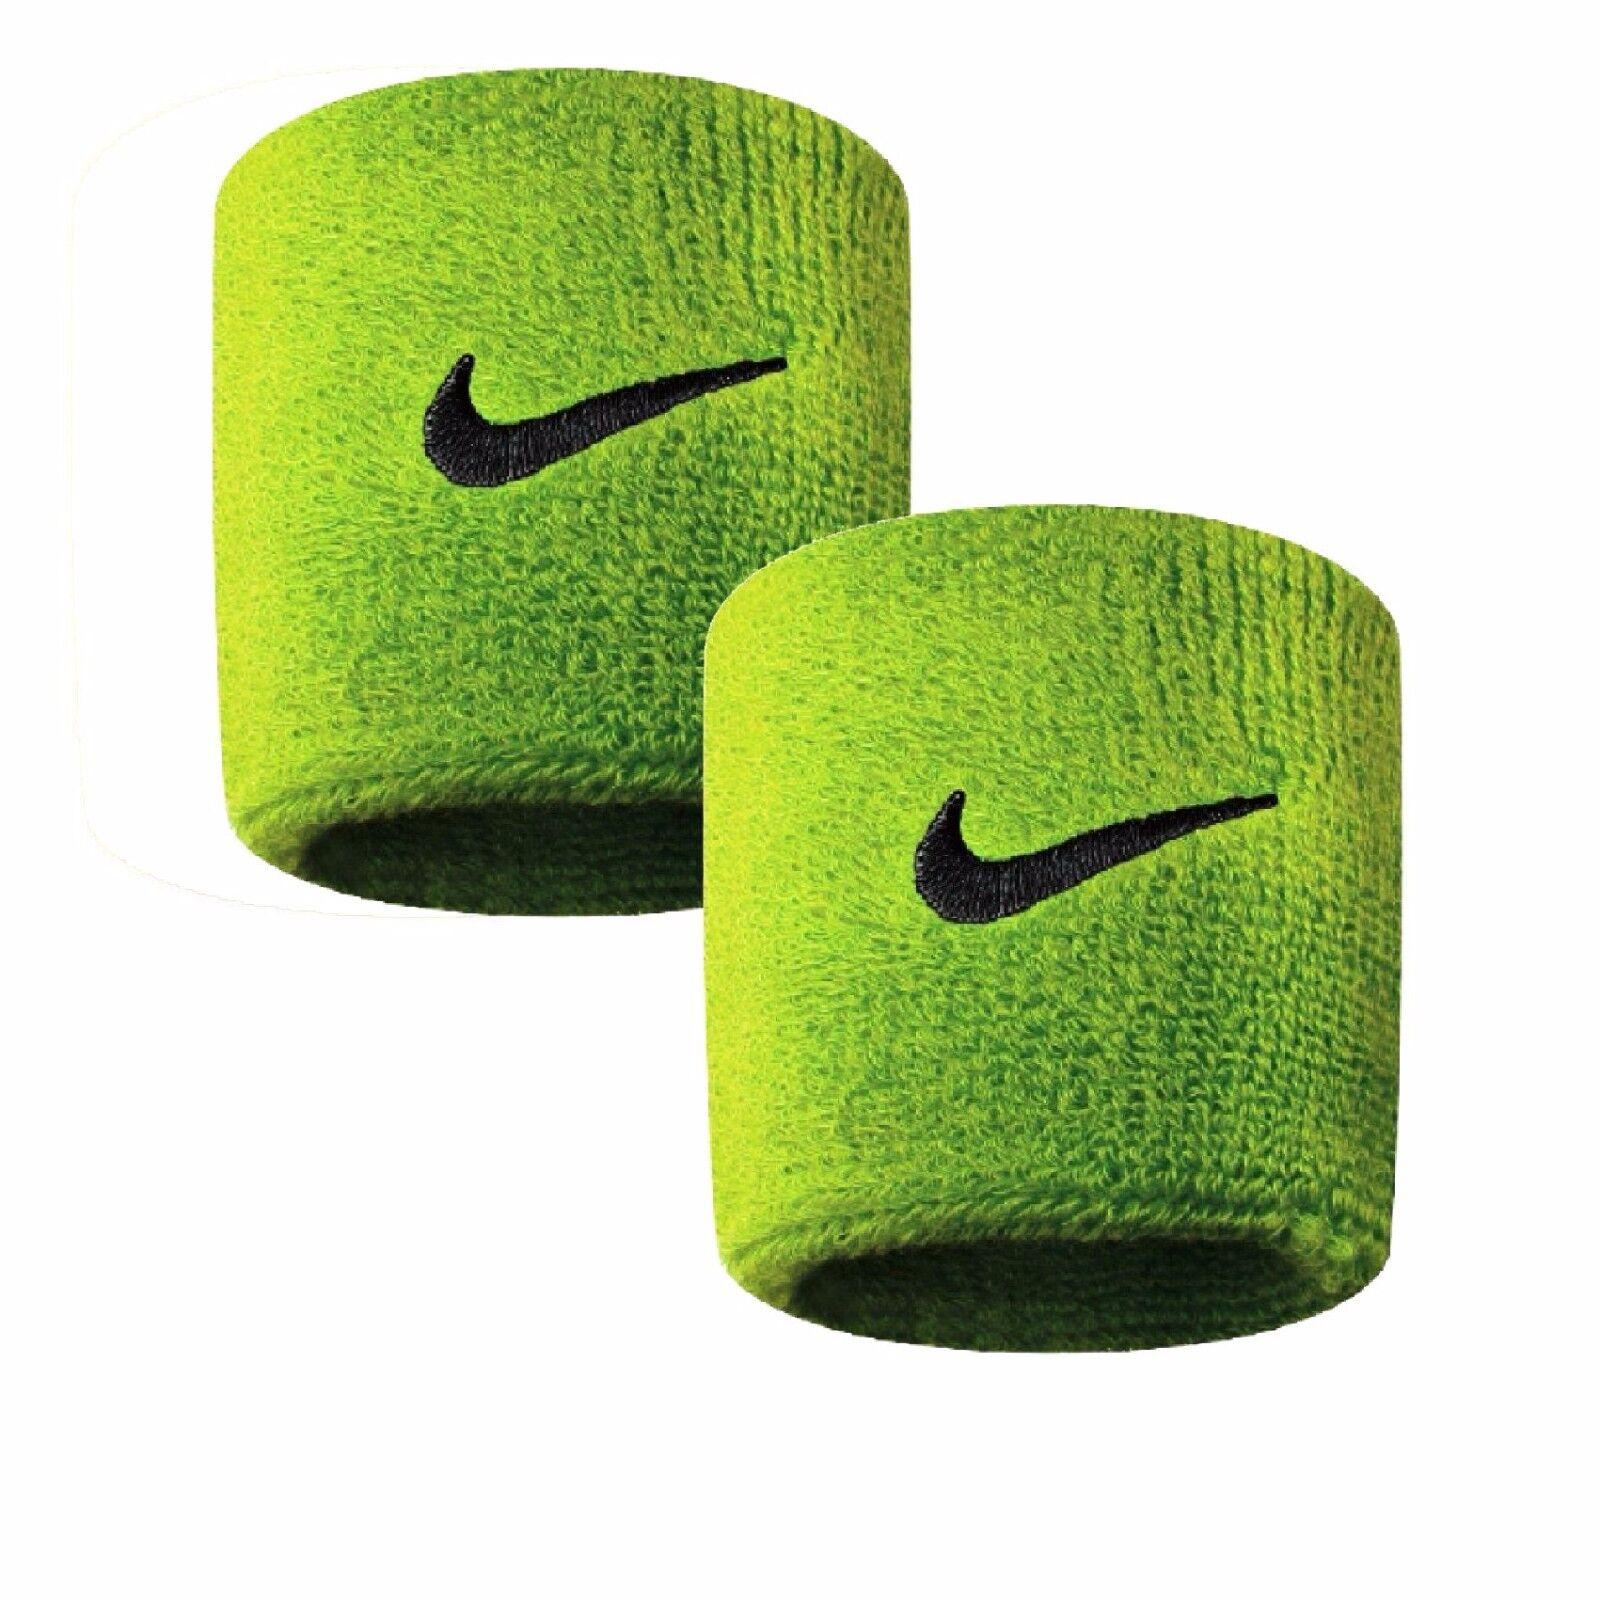 Coppia Polsini Tennis Wristband NIKE Swoosh Wristband Tennis più colori FEDERER NADAL 135183